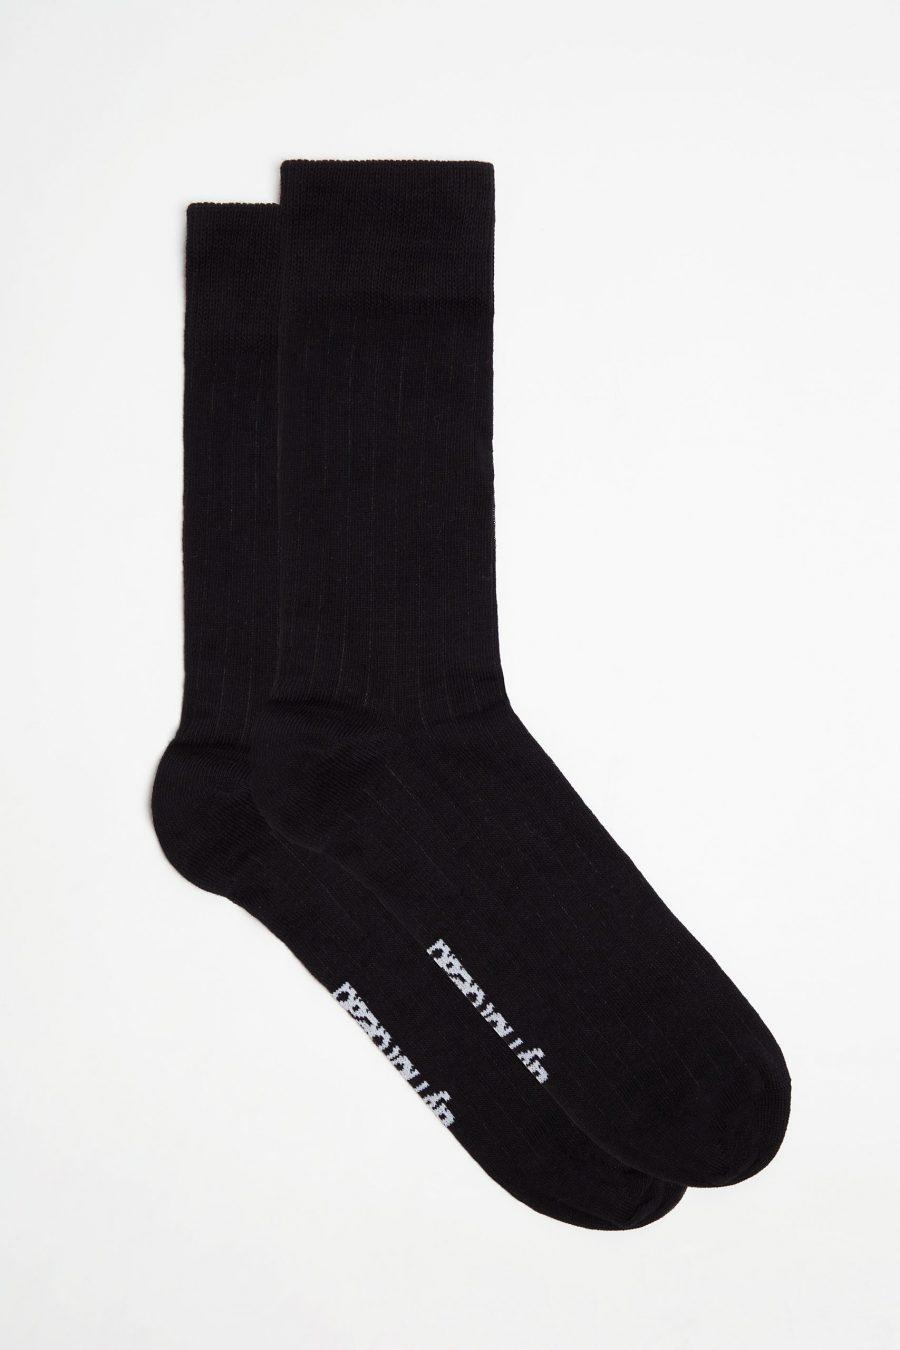 socks bass